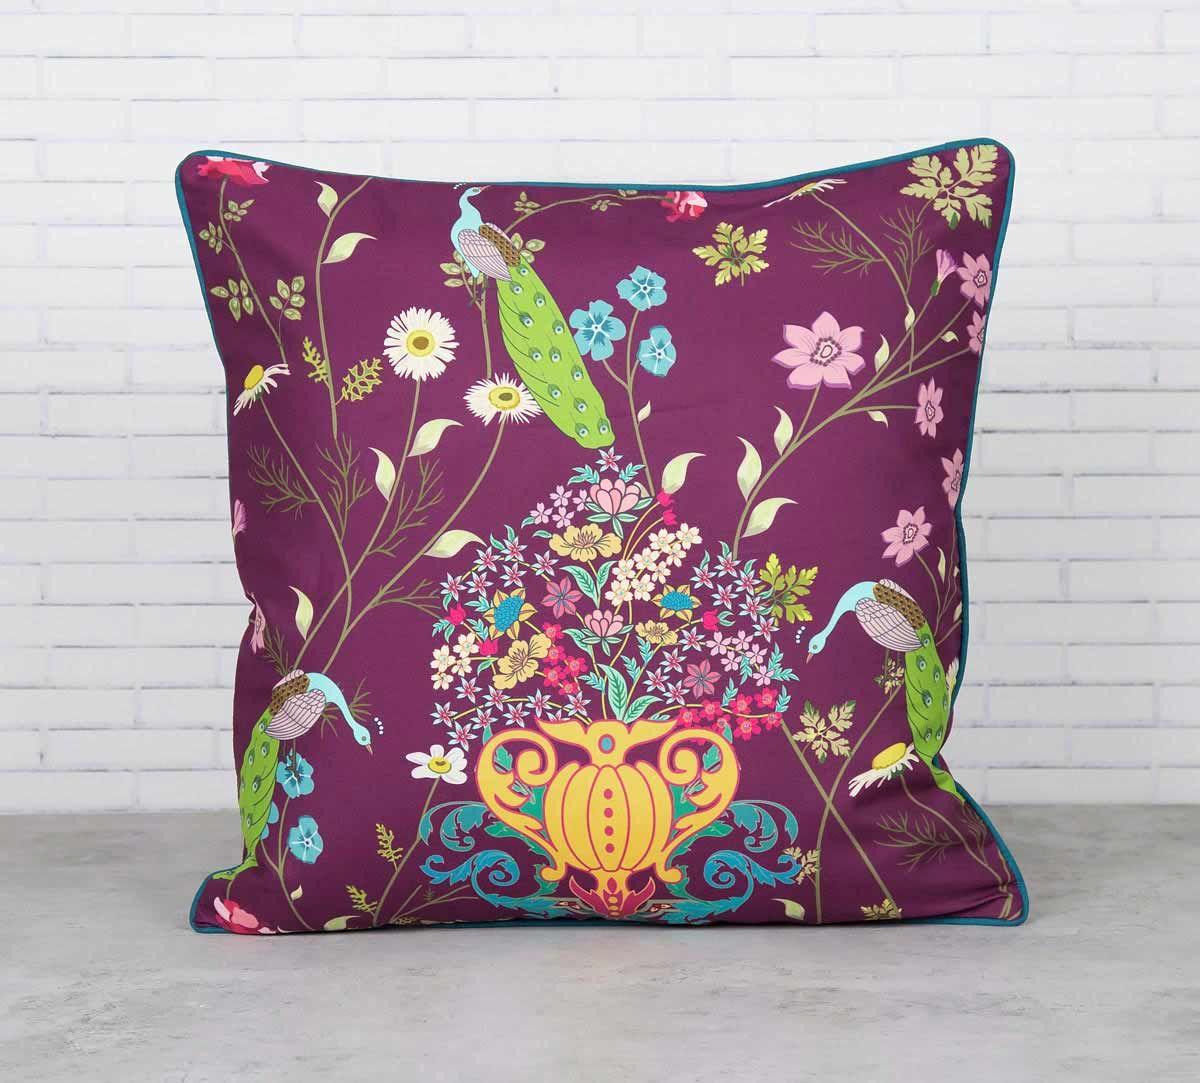 Enchanted Yield Satin Blend Cushion Cover